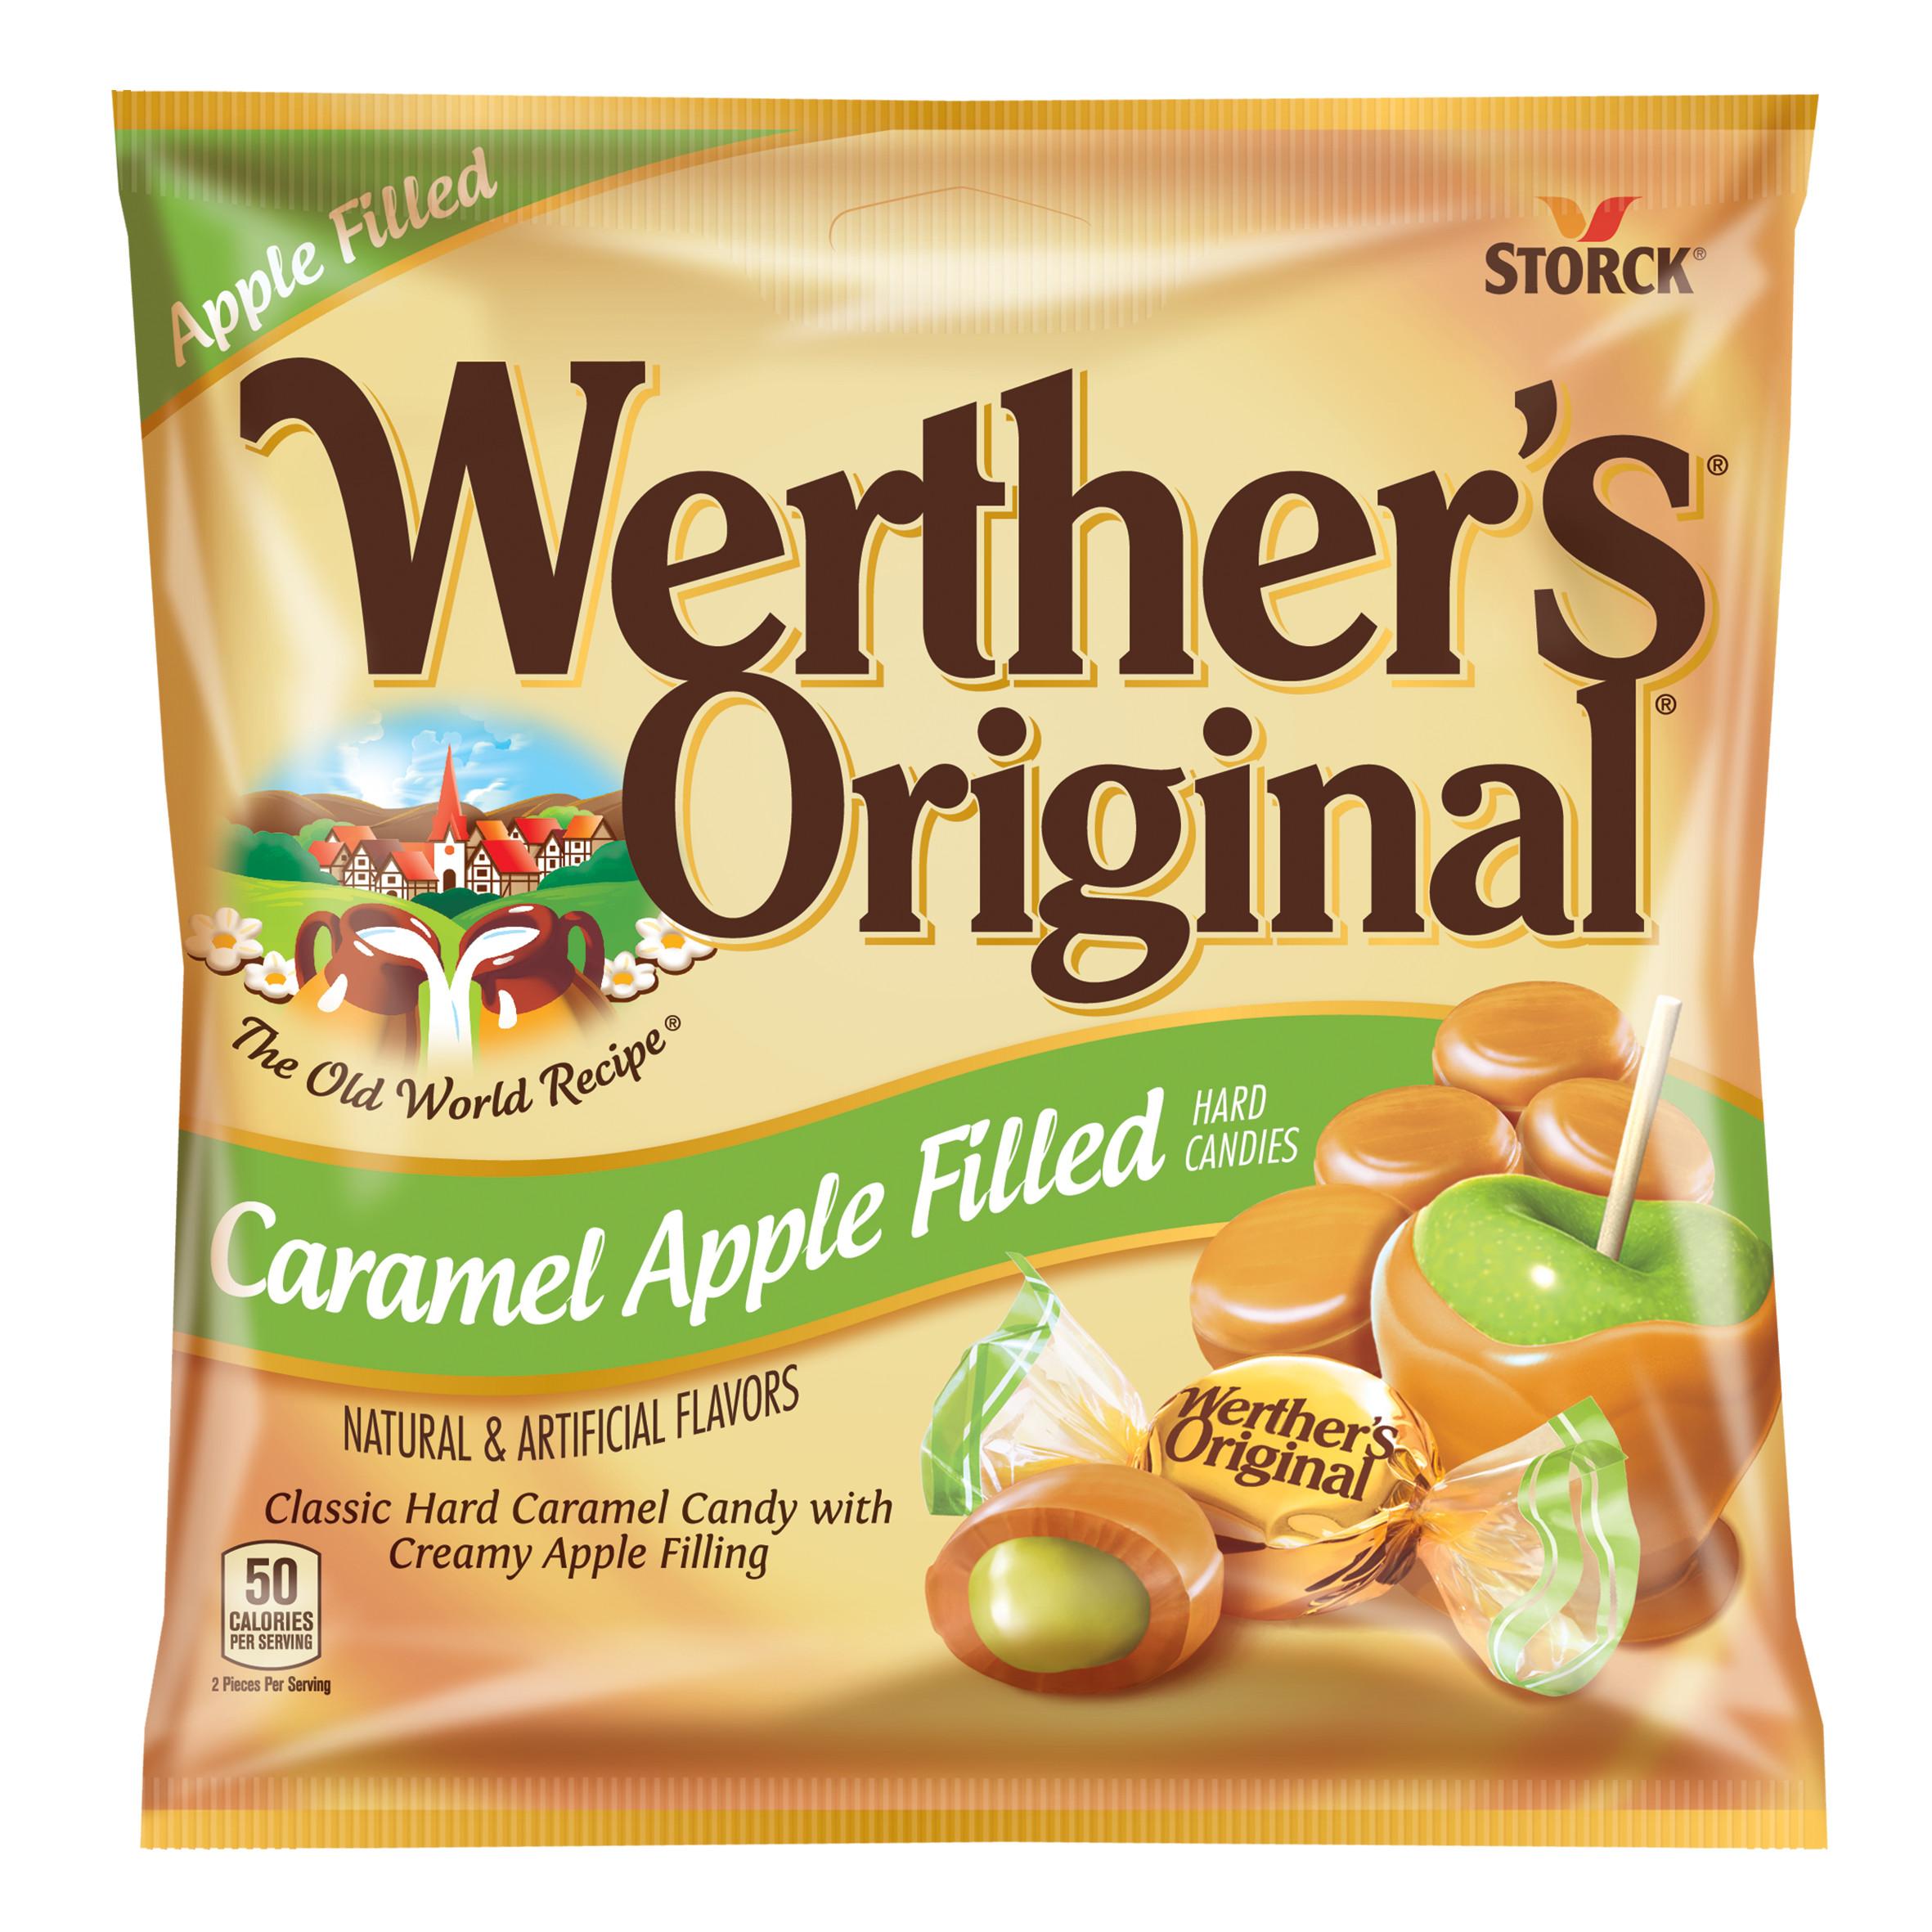 Werther's® Original® Caramel Apple Filled Hard Candies